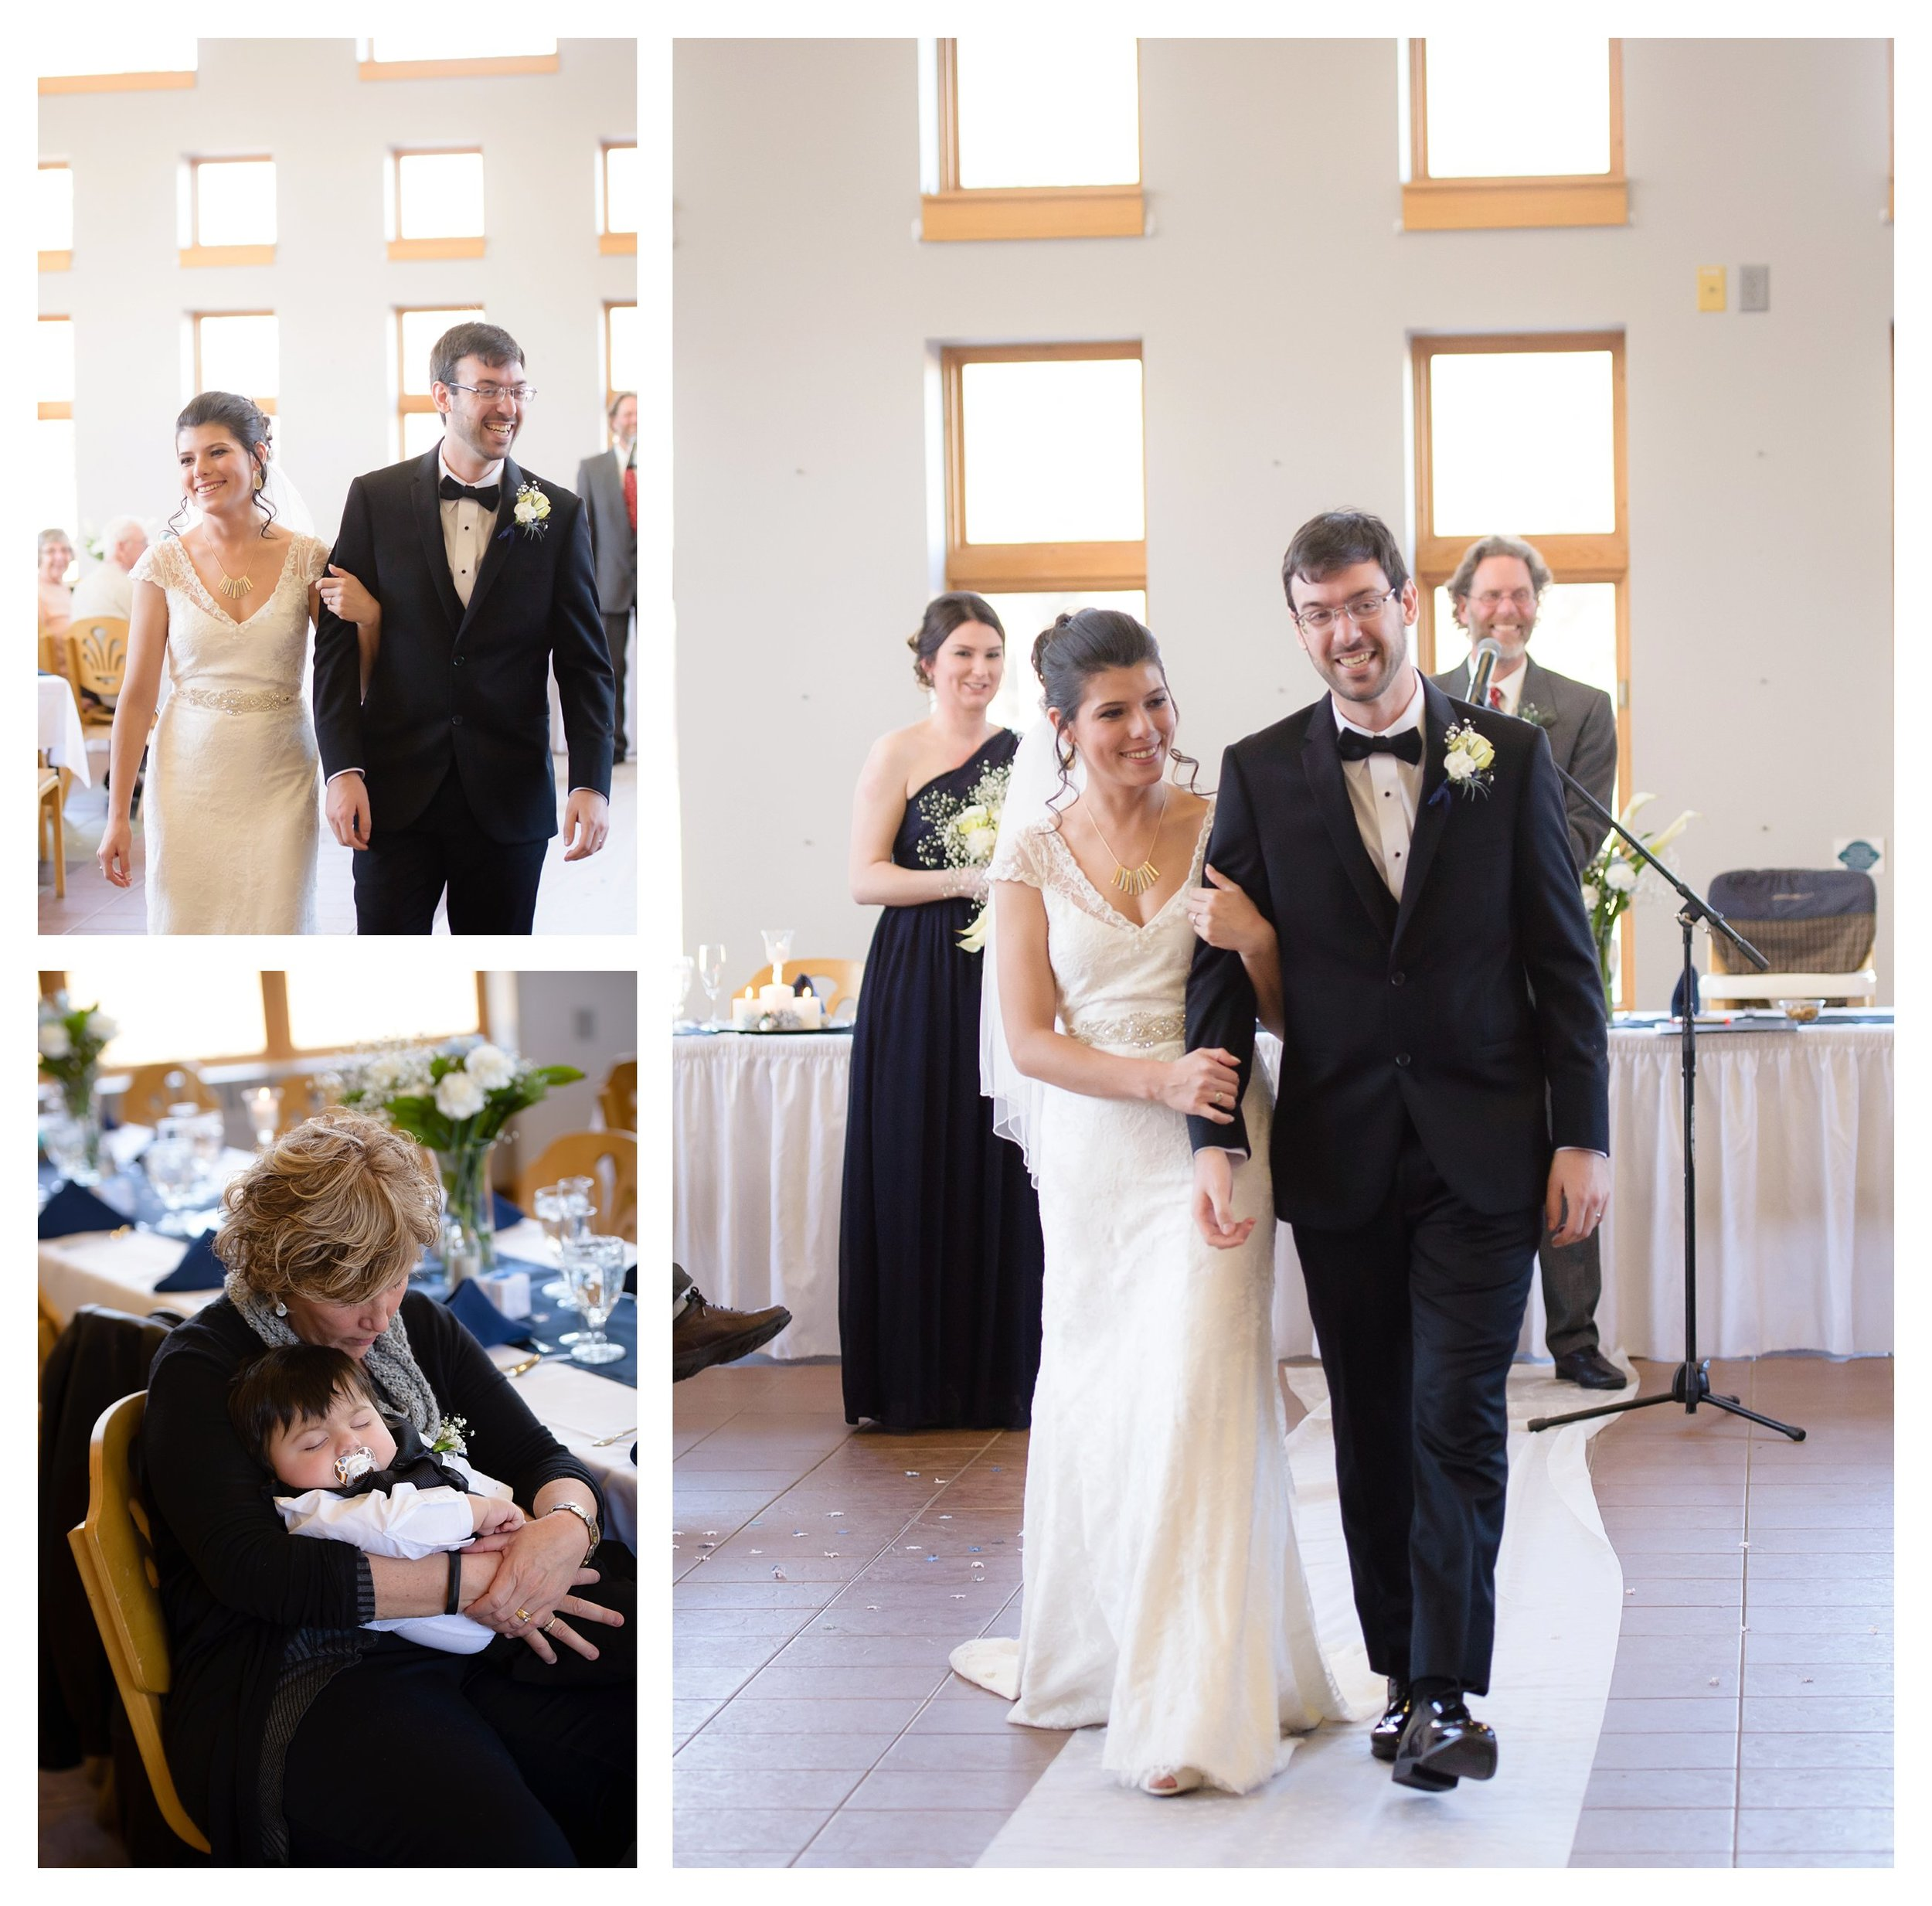 ashland wedding photographer iron river brule wisconsin ps 139 photography jen jensen_0134.jpg